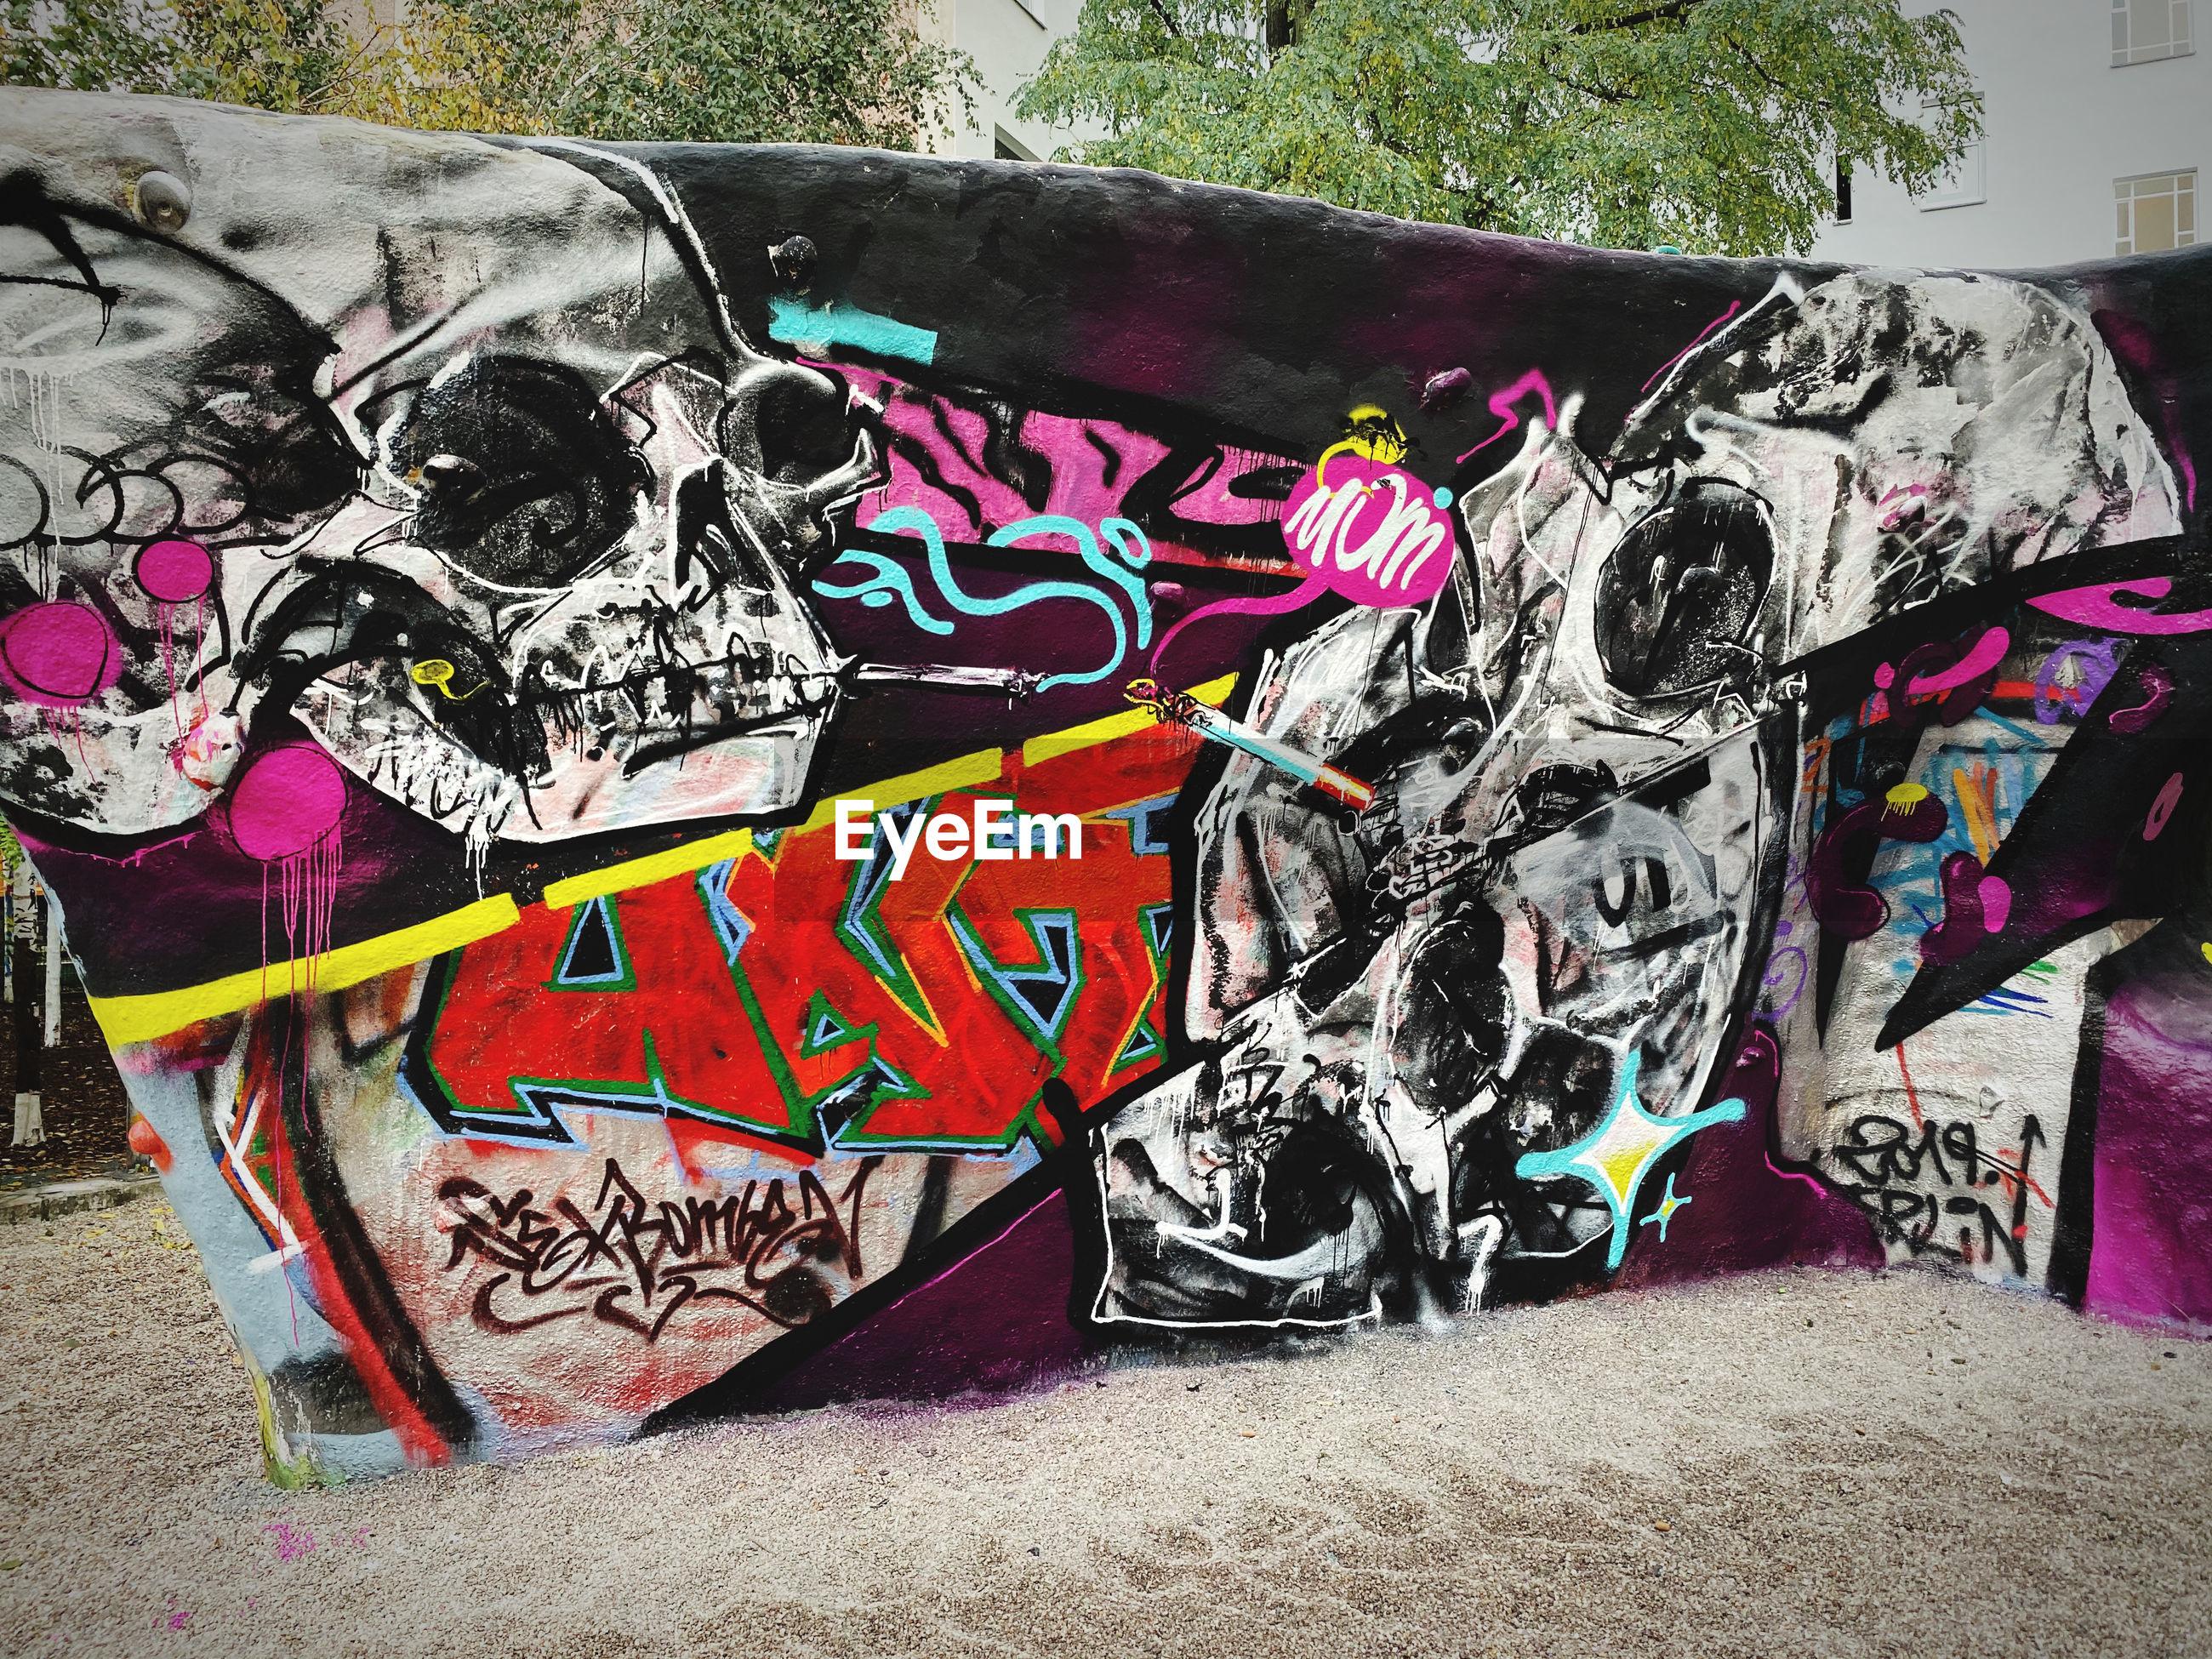 GRAFFITI ON WALL BY TEXT ON BRICK WALLS